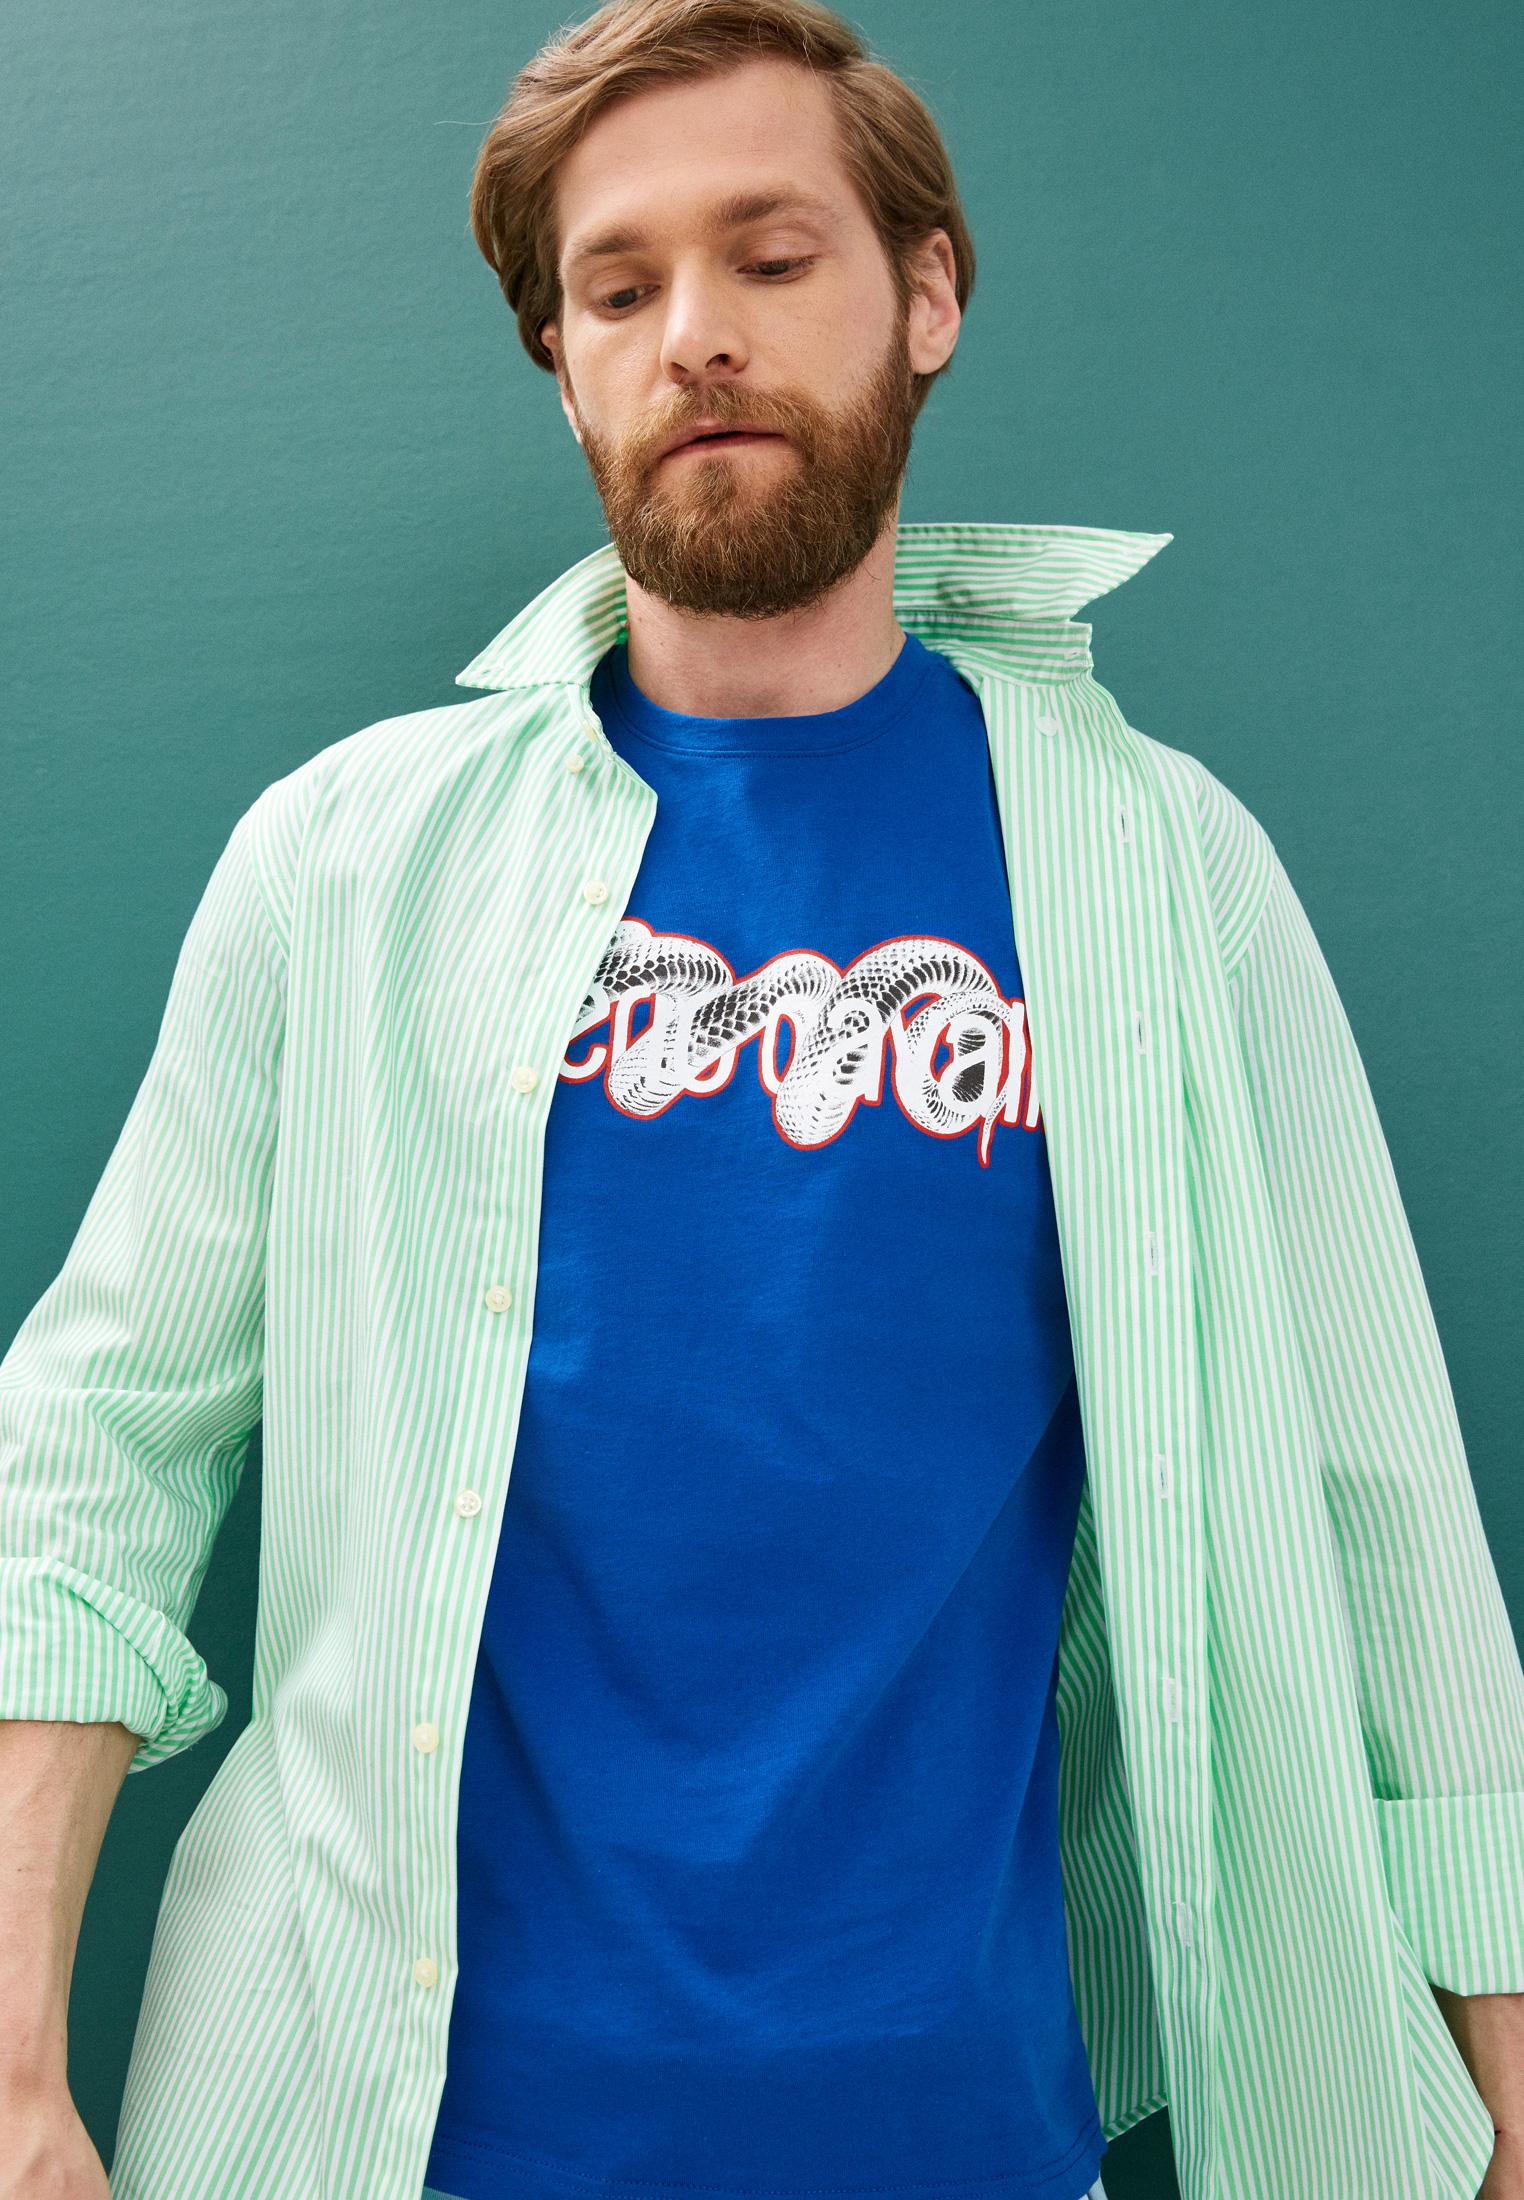 Мужская футболка Roberto Cavalli (Роберто Кавалли) GST655A027: изображение 2